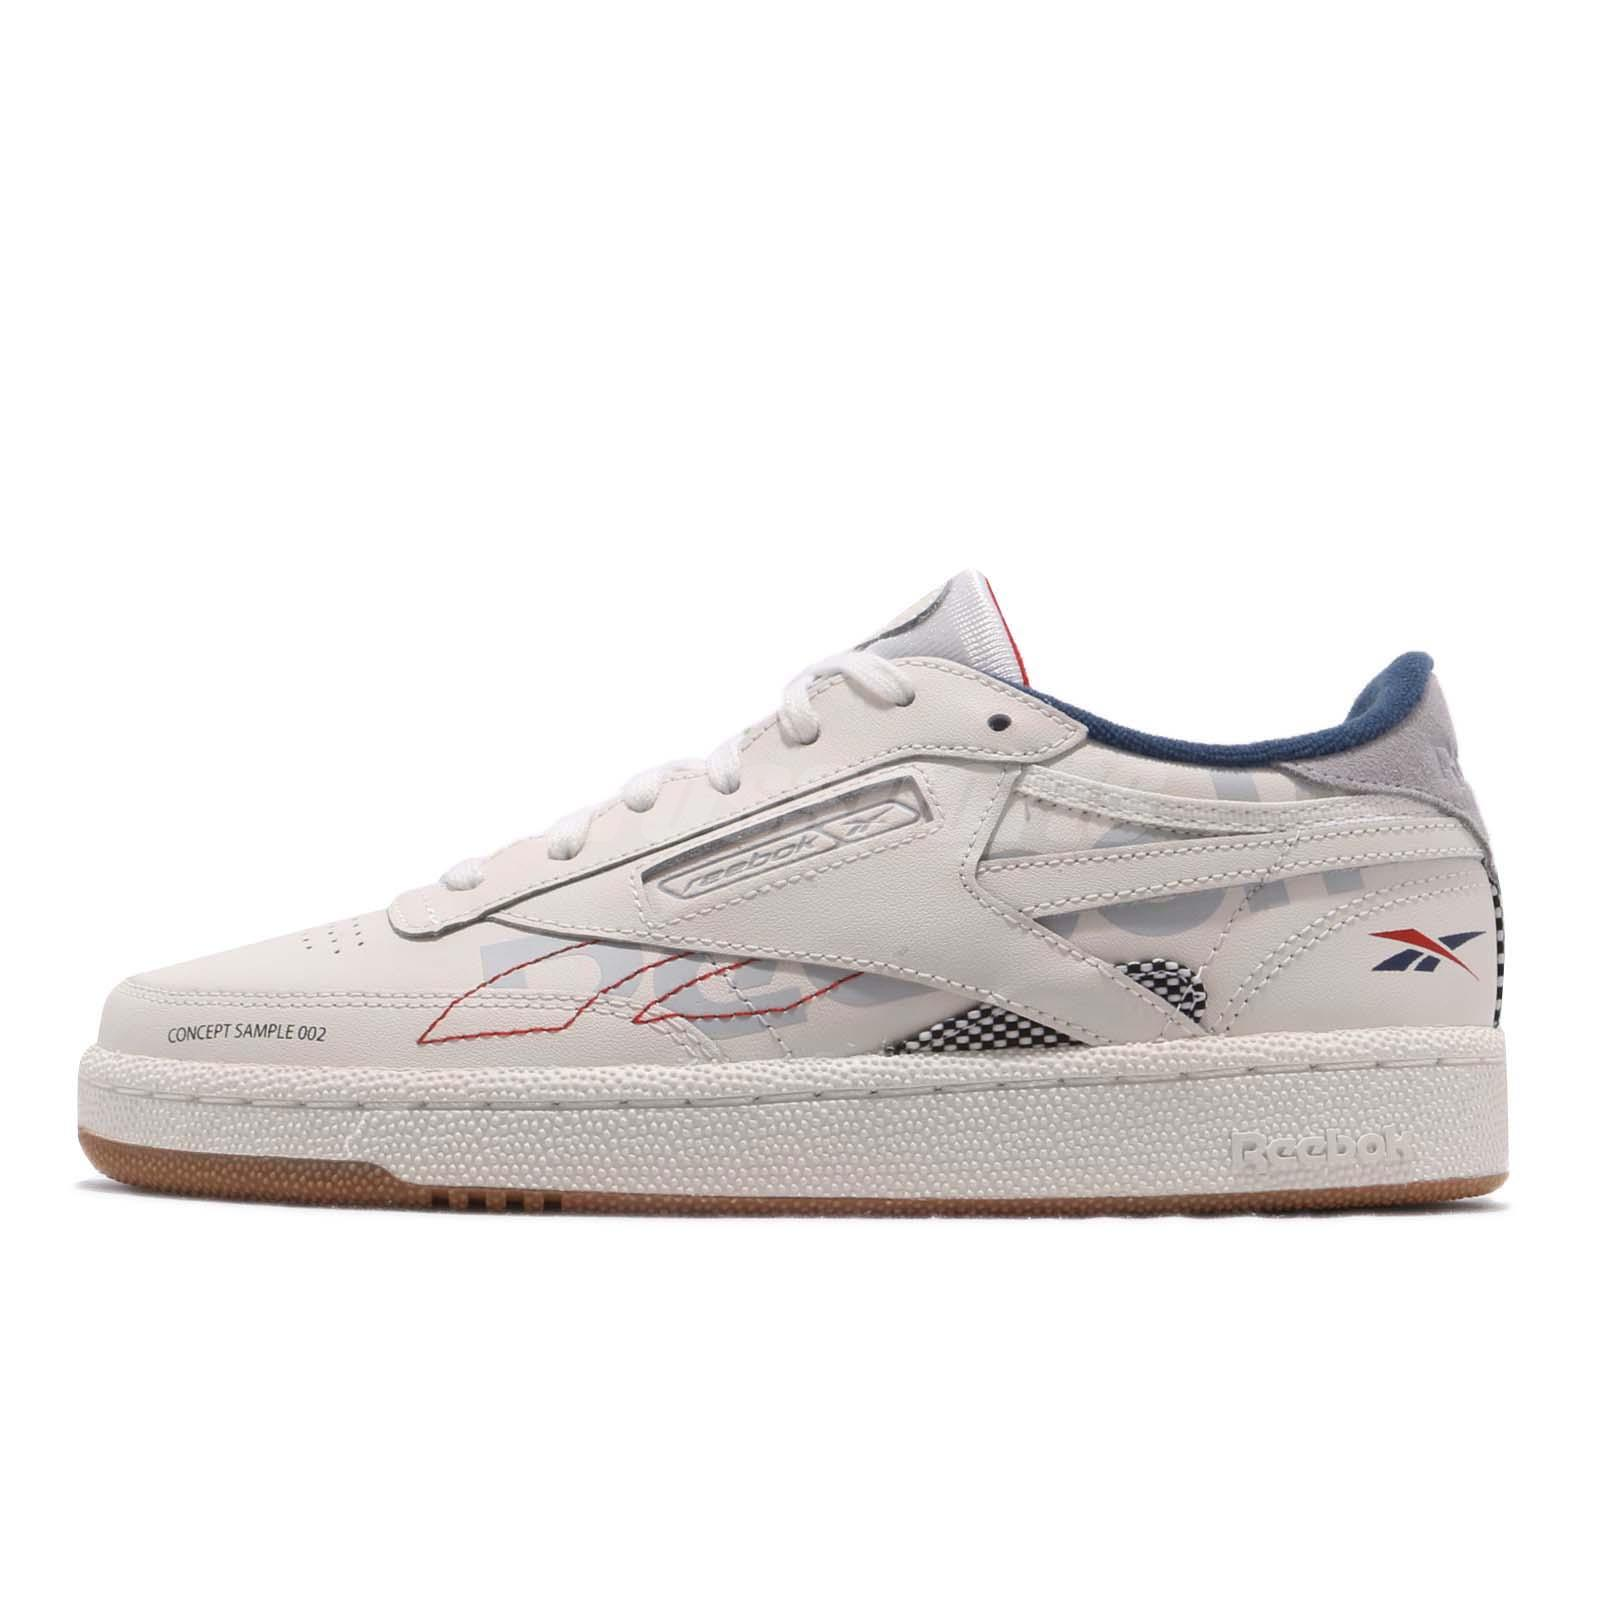 02db2bcb9e4c Details about Reebok Club C 85 ATI 90s Chalk Grey Blue Red Gum Men Casual  Shoes Sneaker DV8961